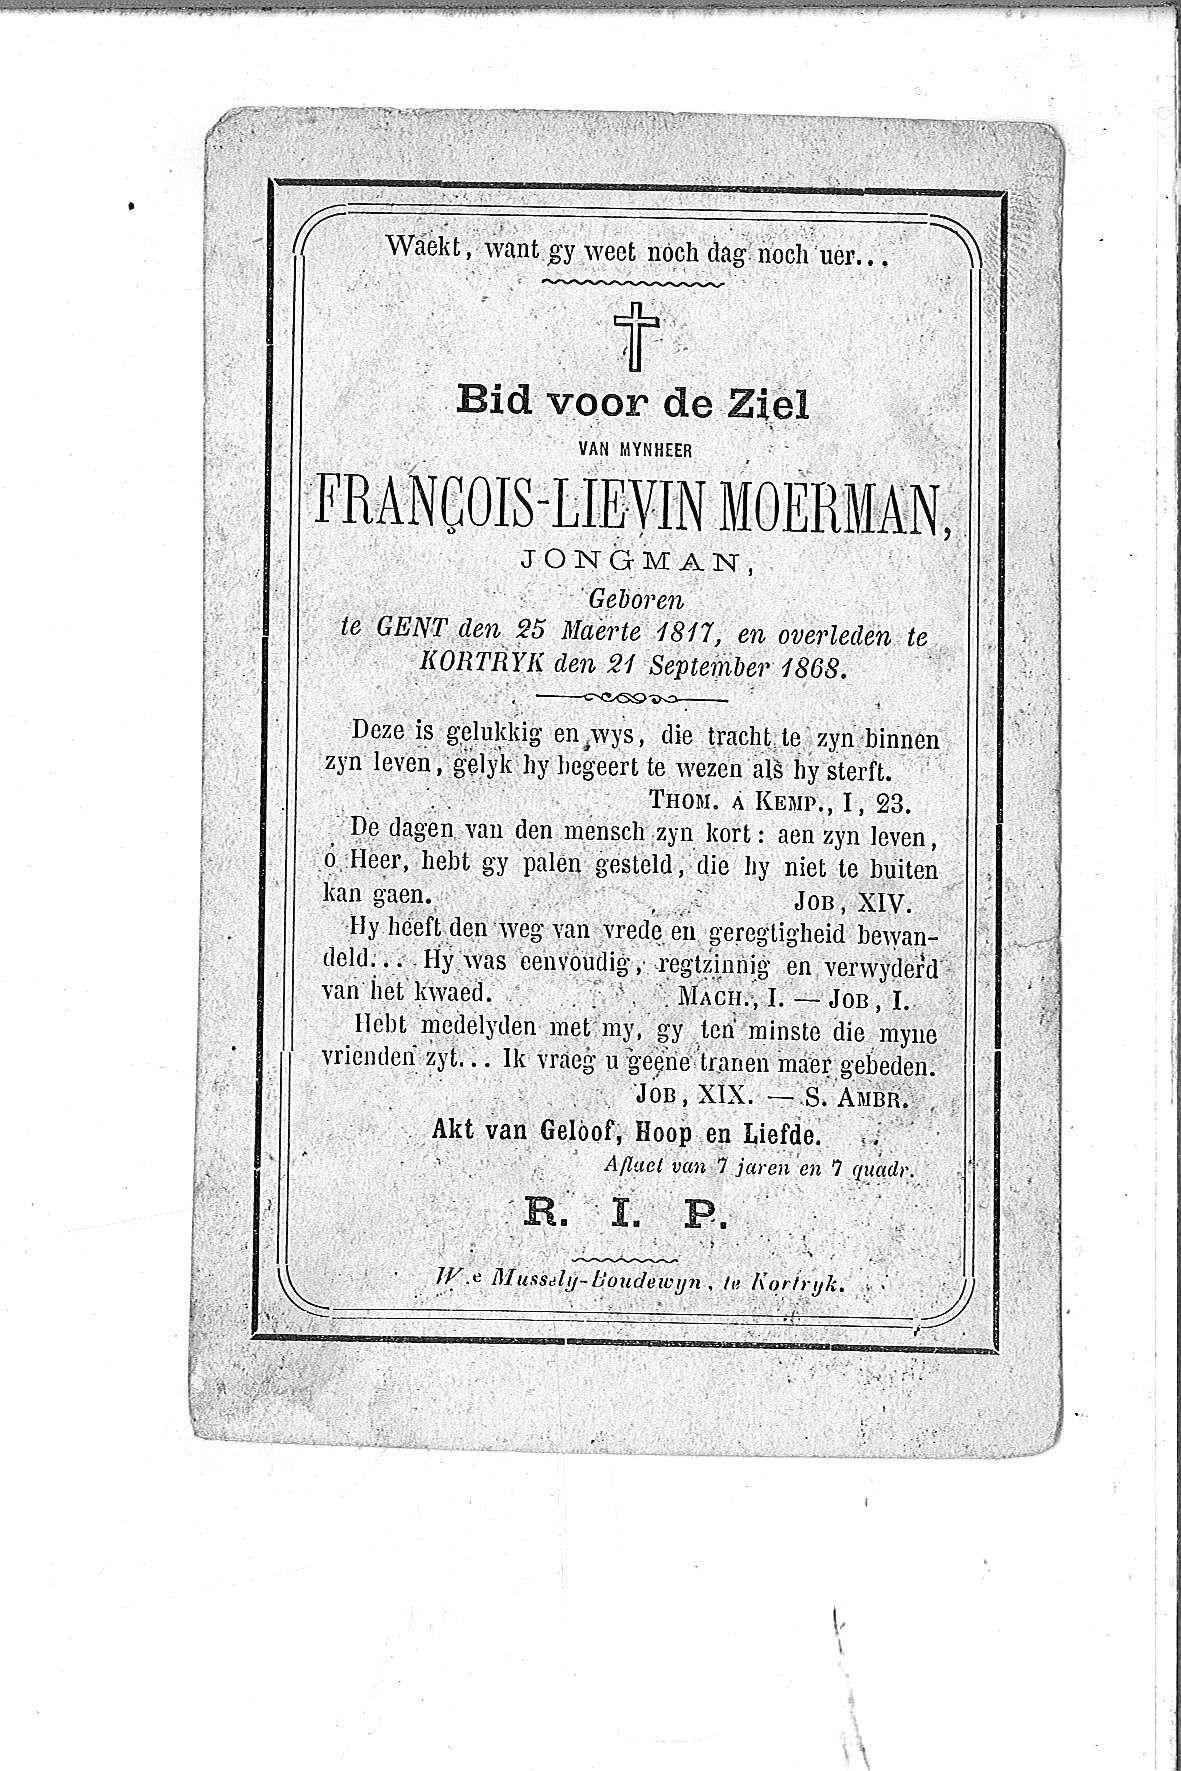 François-Lievin(1868)20140522132227_00058.jpg